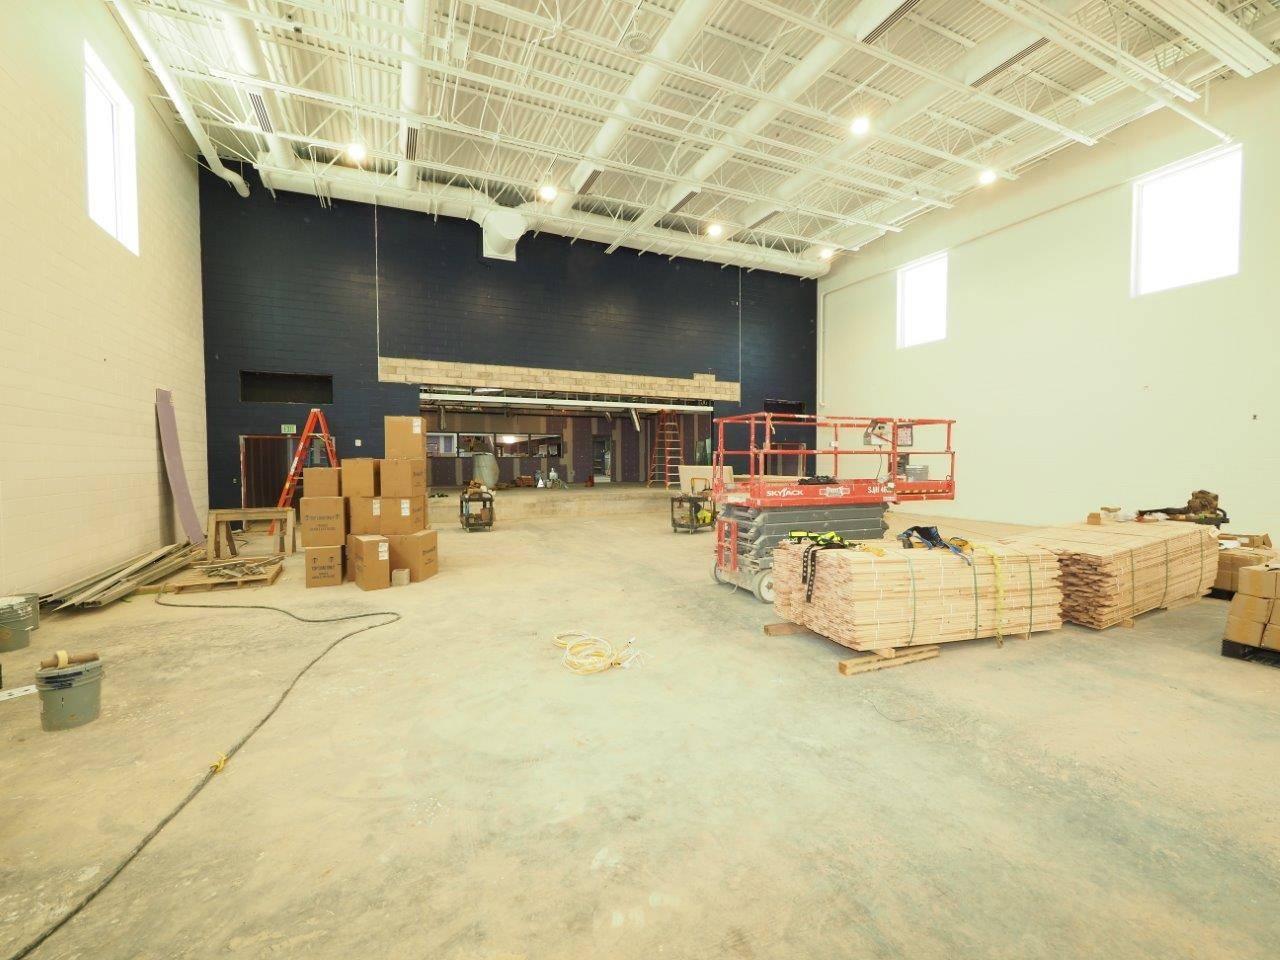 Inside the new Wickliffe gymnasium